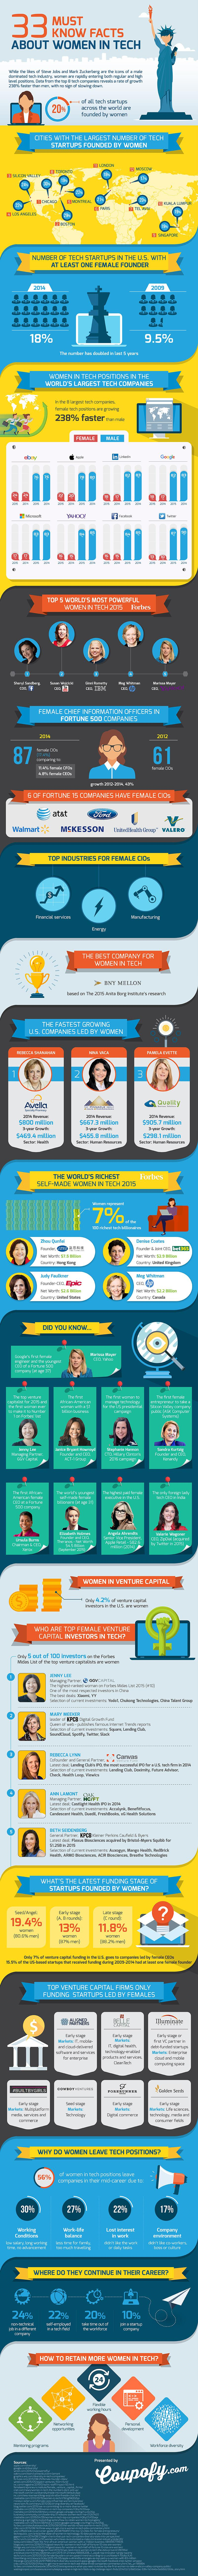 women-in-tech-infographic